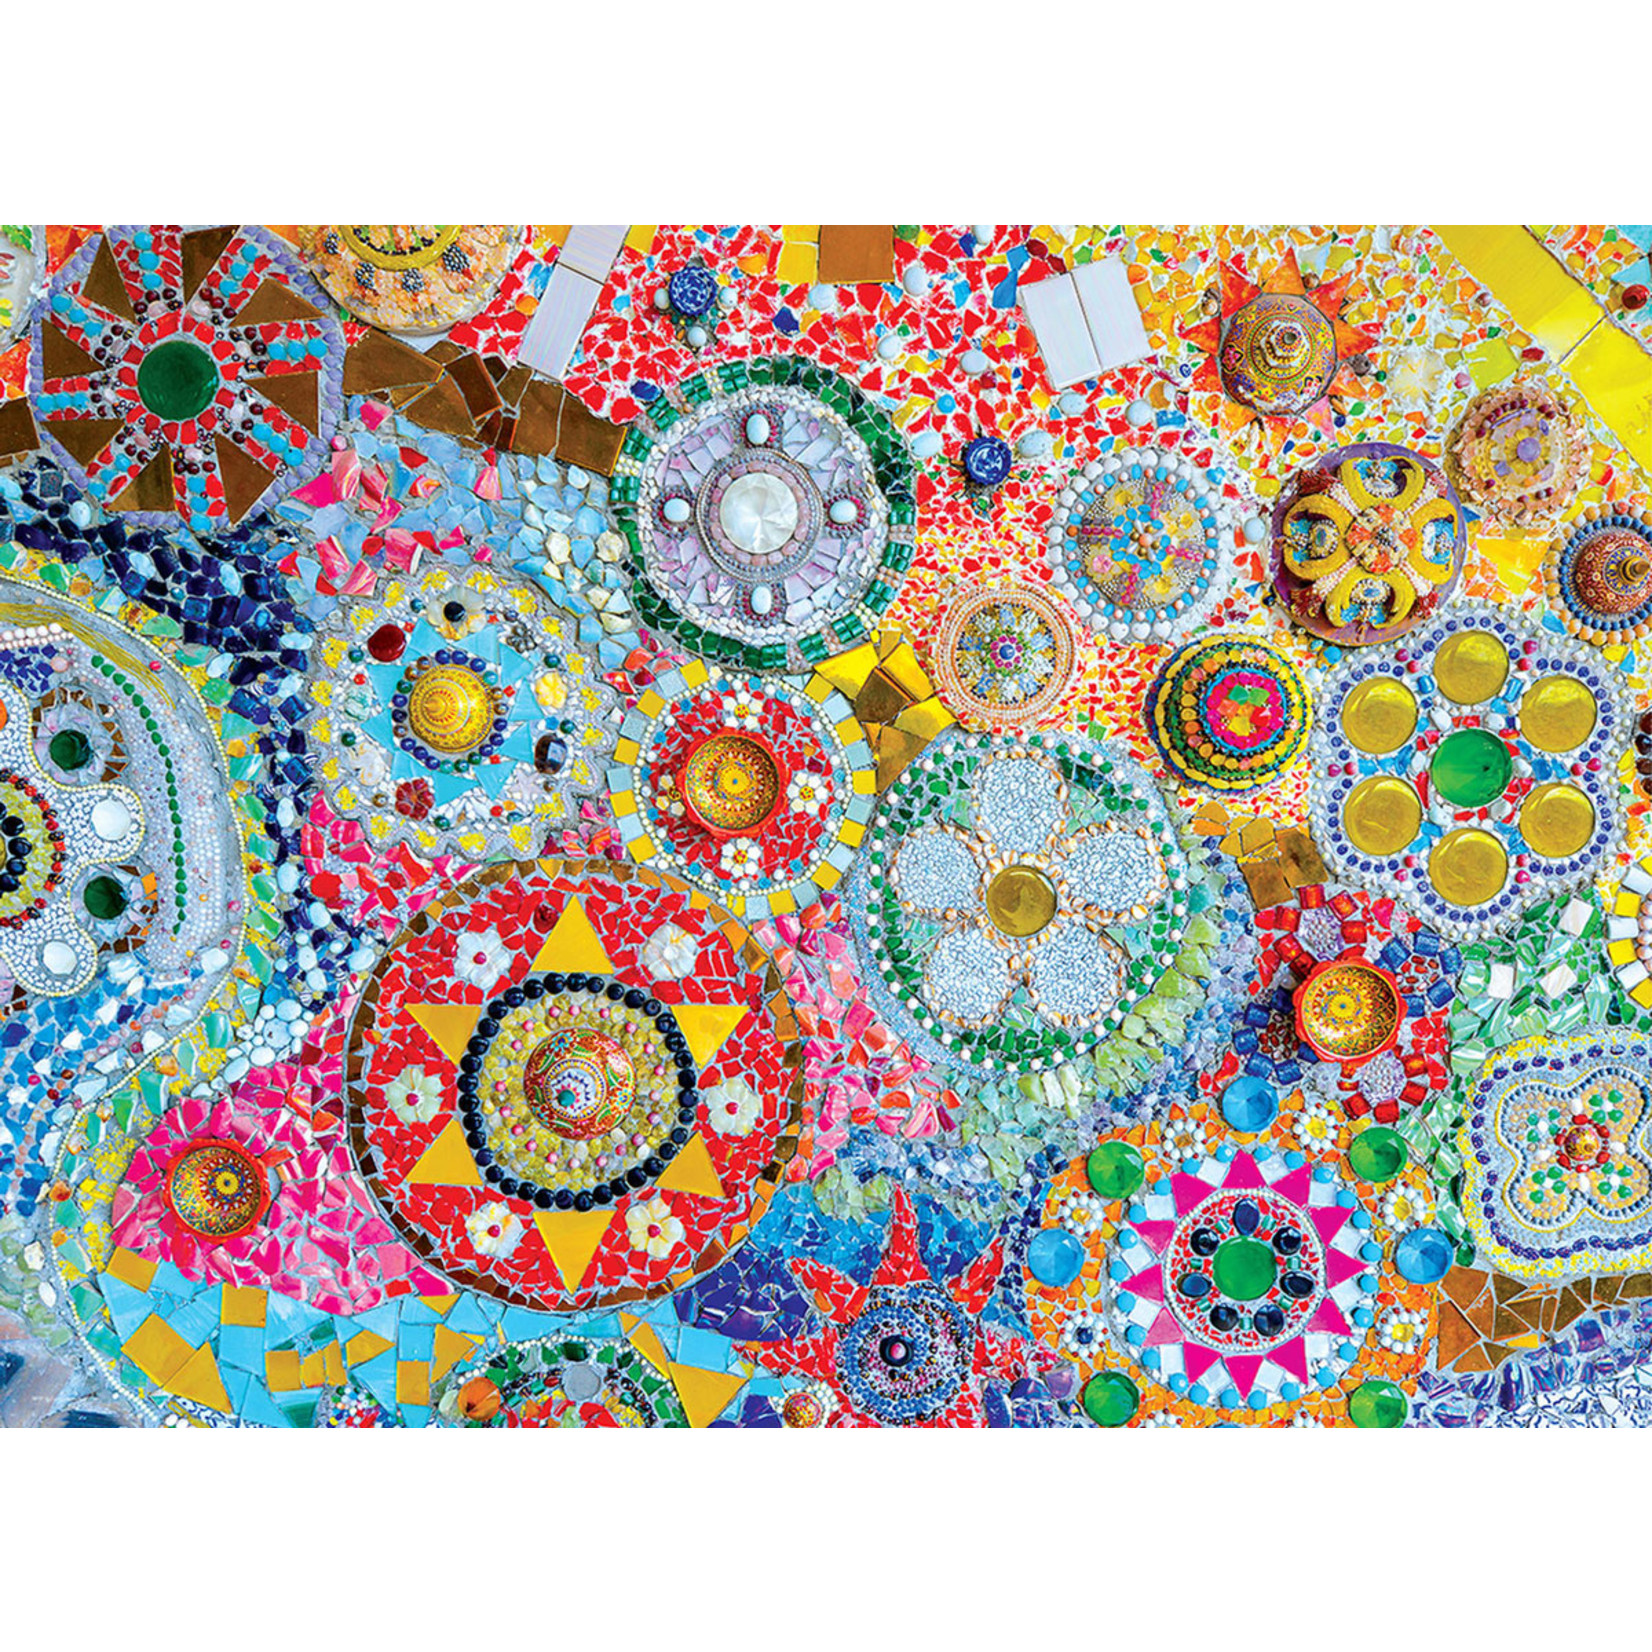 EuroGraphics Puzzles Thailand Mosaic 1000 Pc